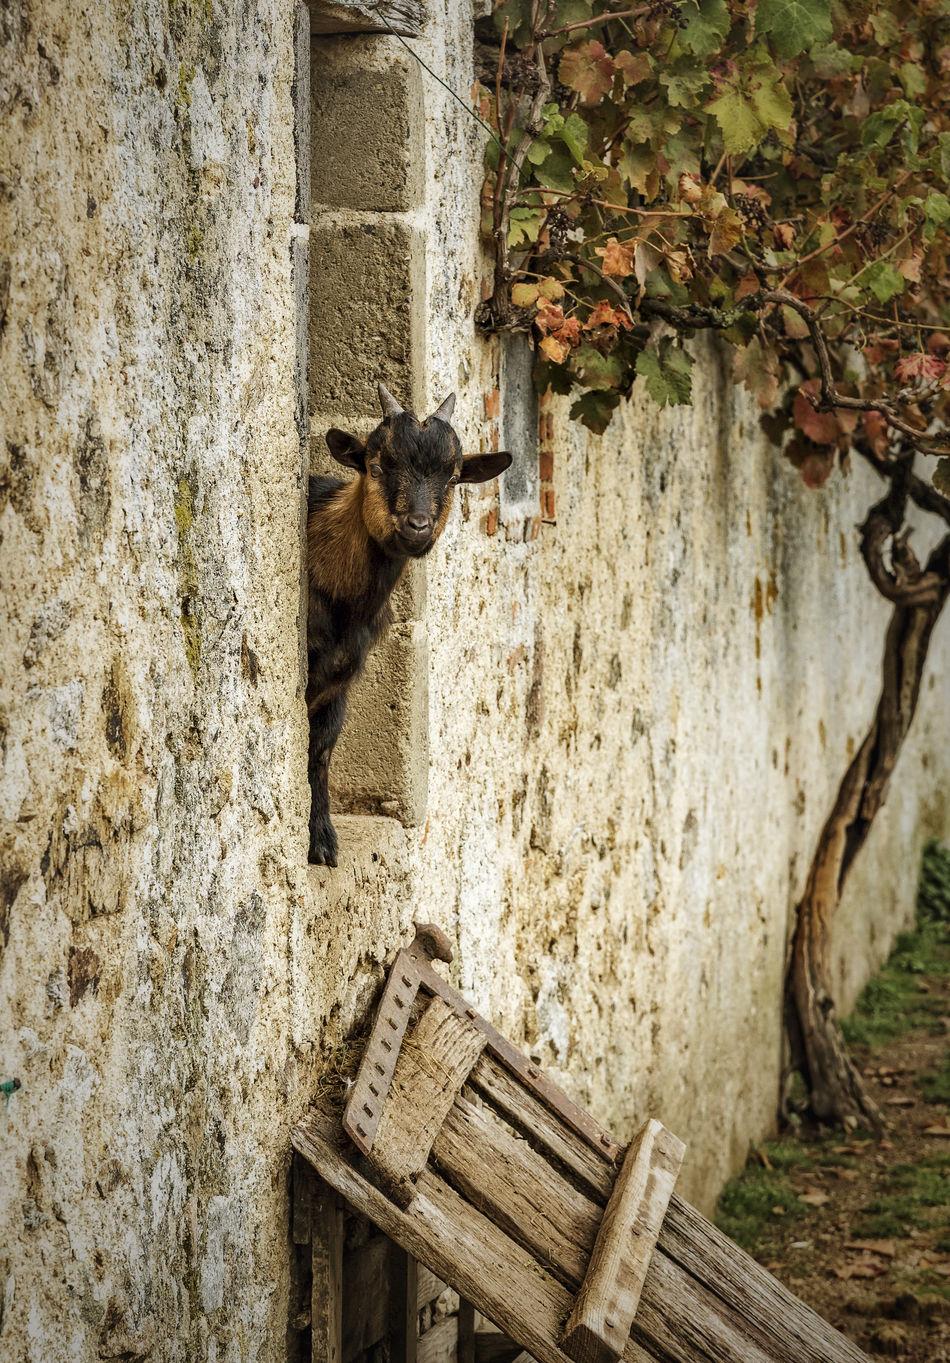 Young goat living on a French gite. Barn Farm Animal France Gite Goat Hiding Kid Peeking Rustic Young Goat